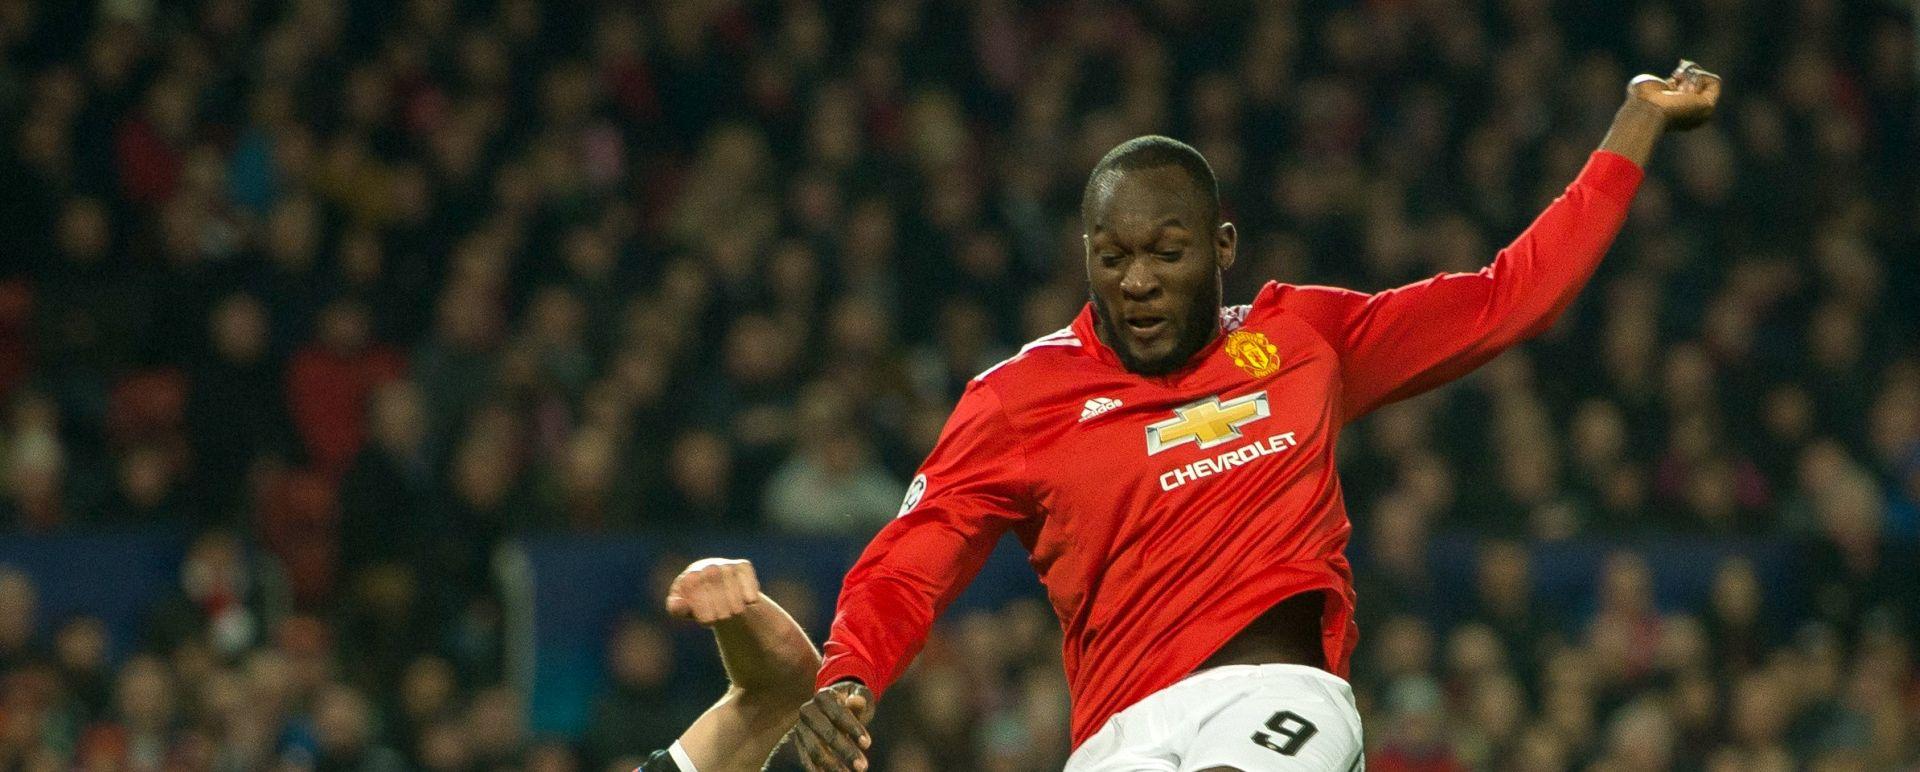 Pobjede Manchester Uniteda i West Hama